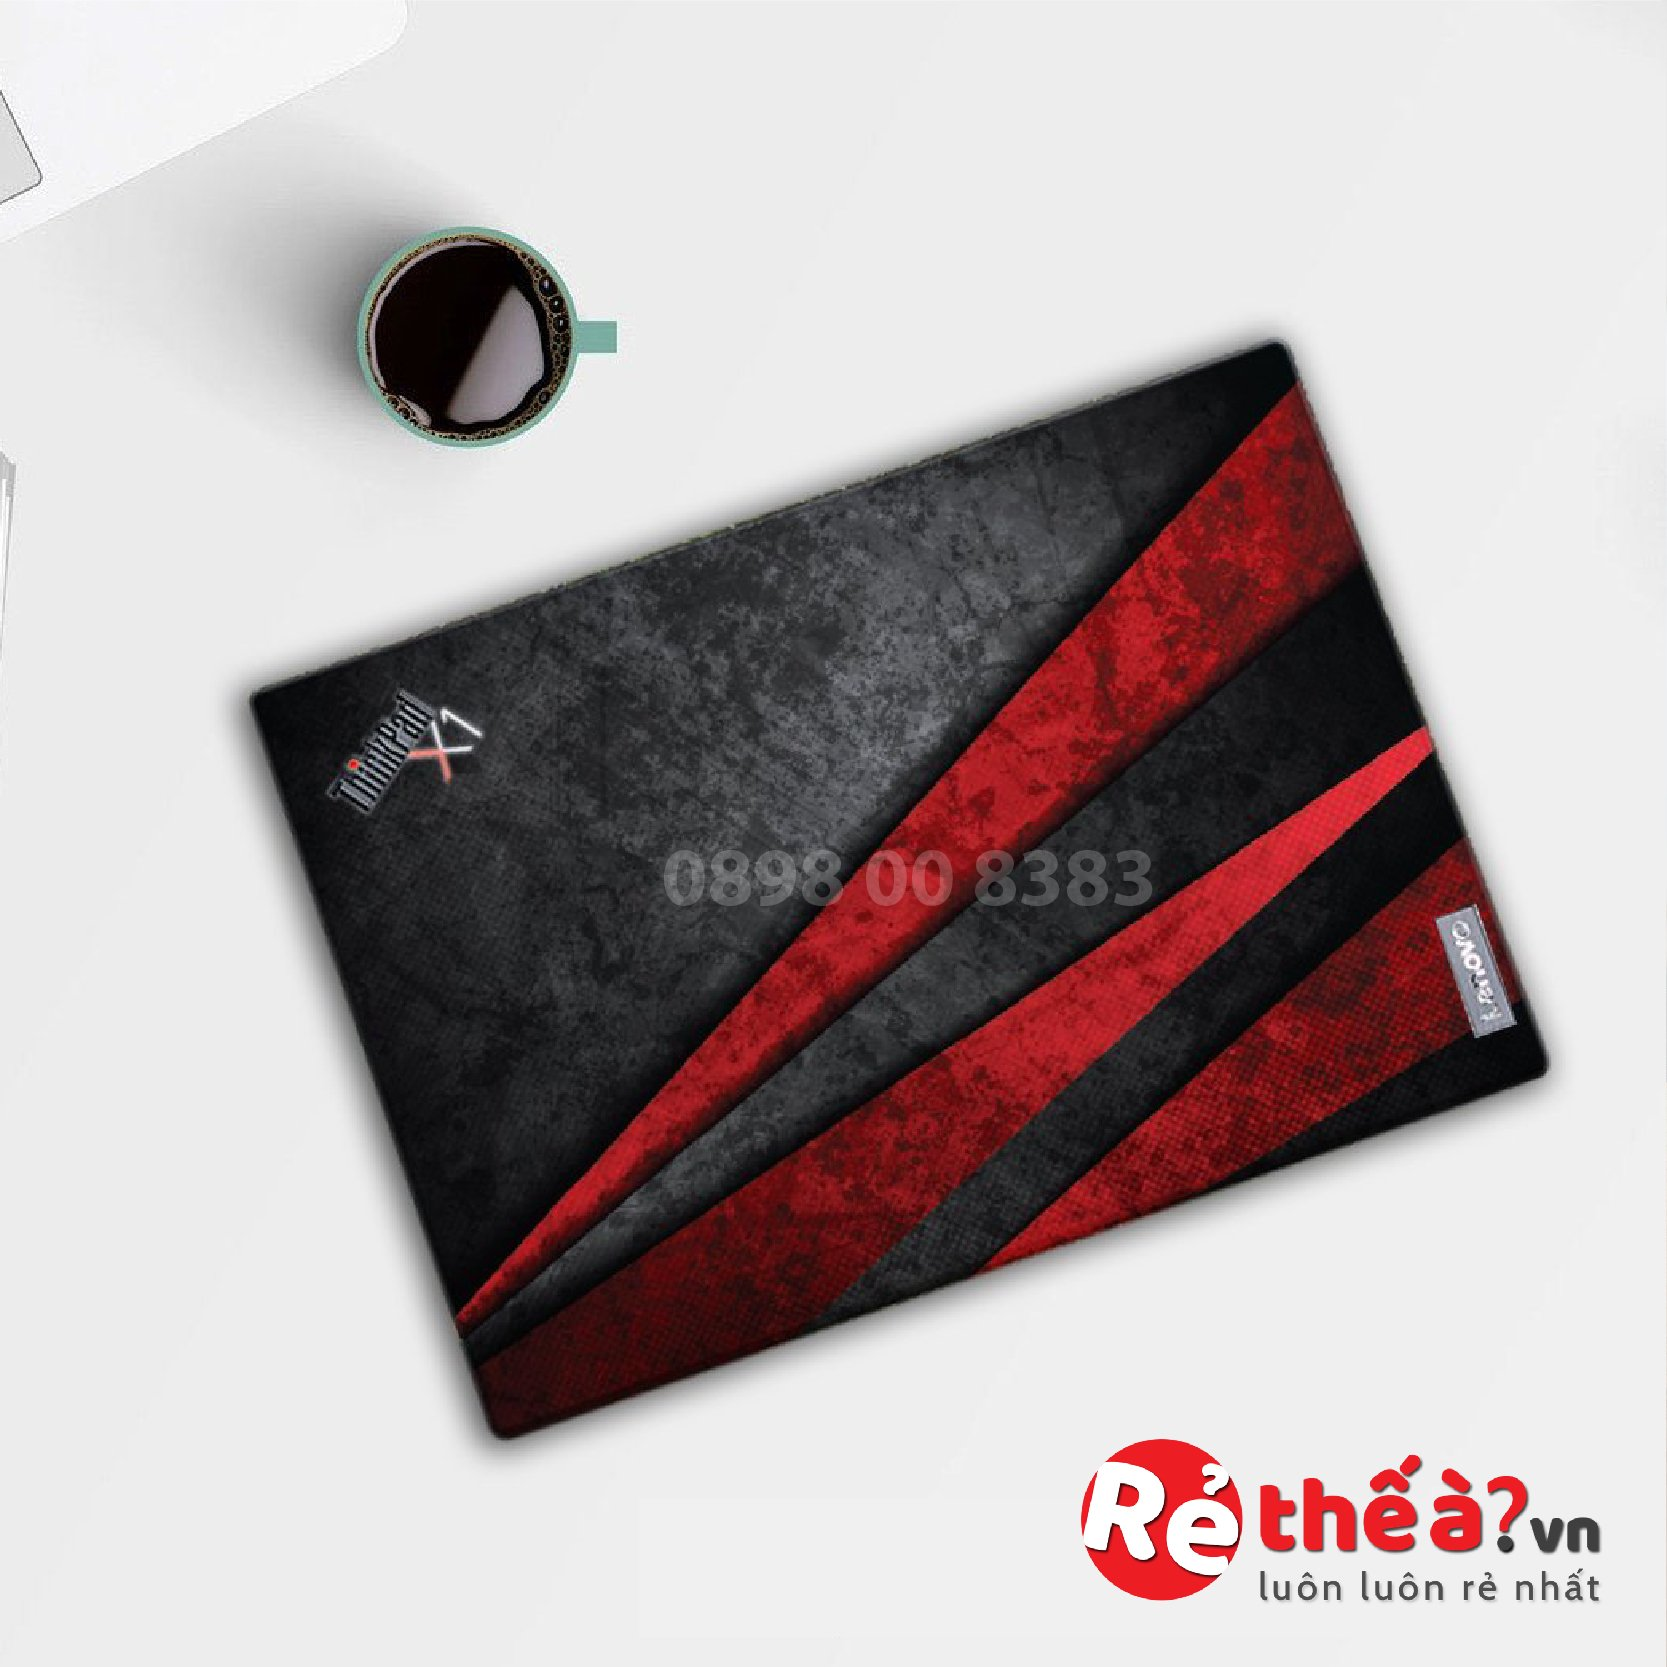 Miếng dán laptop - Dán cho Dell, Hp, Asus, Lenovo, Acer, MSI, Surface,Vaio, Macbook